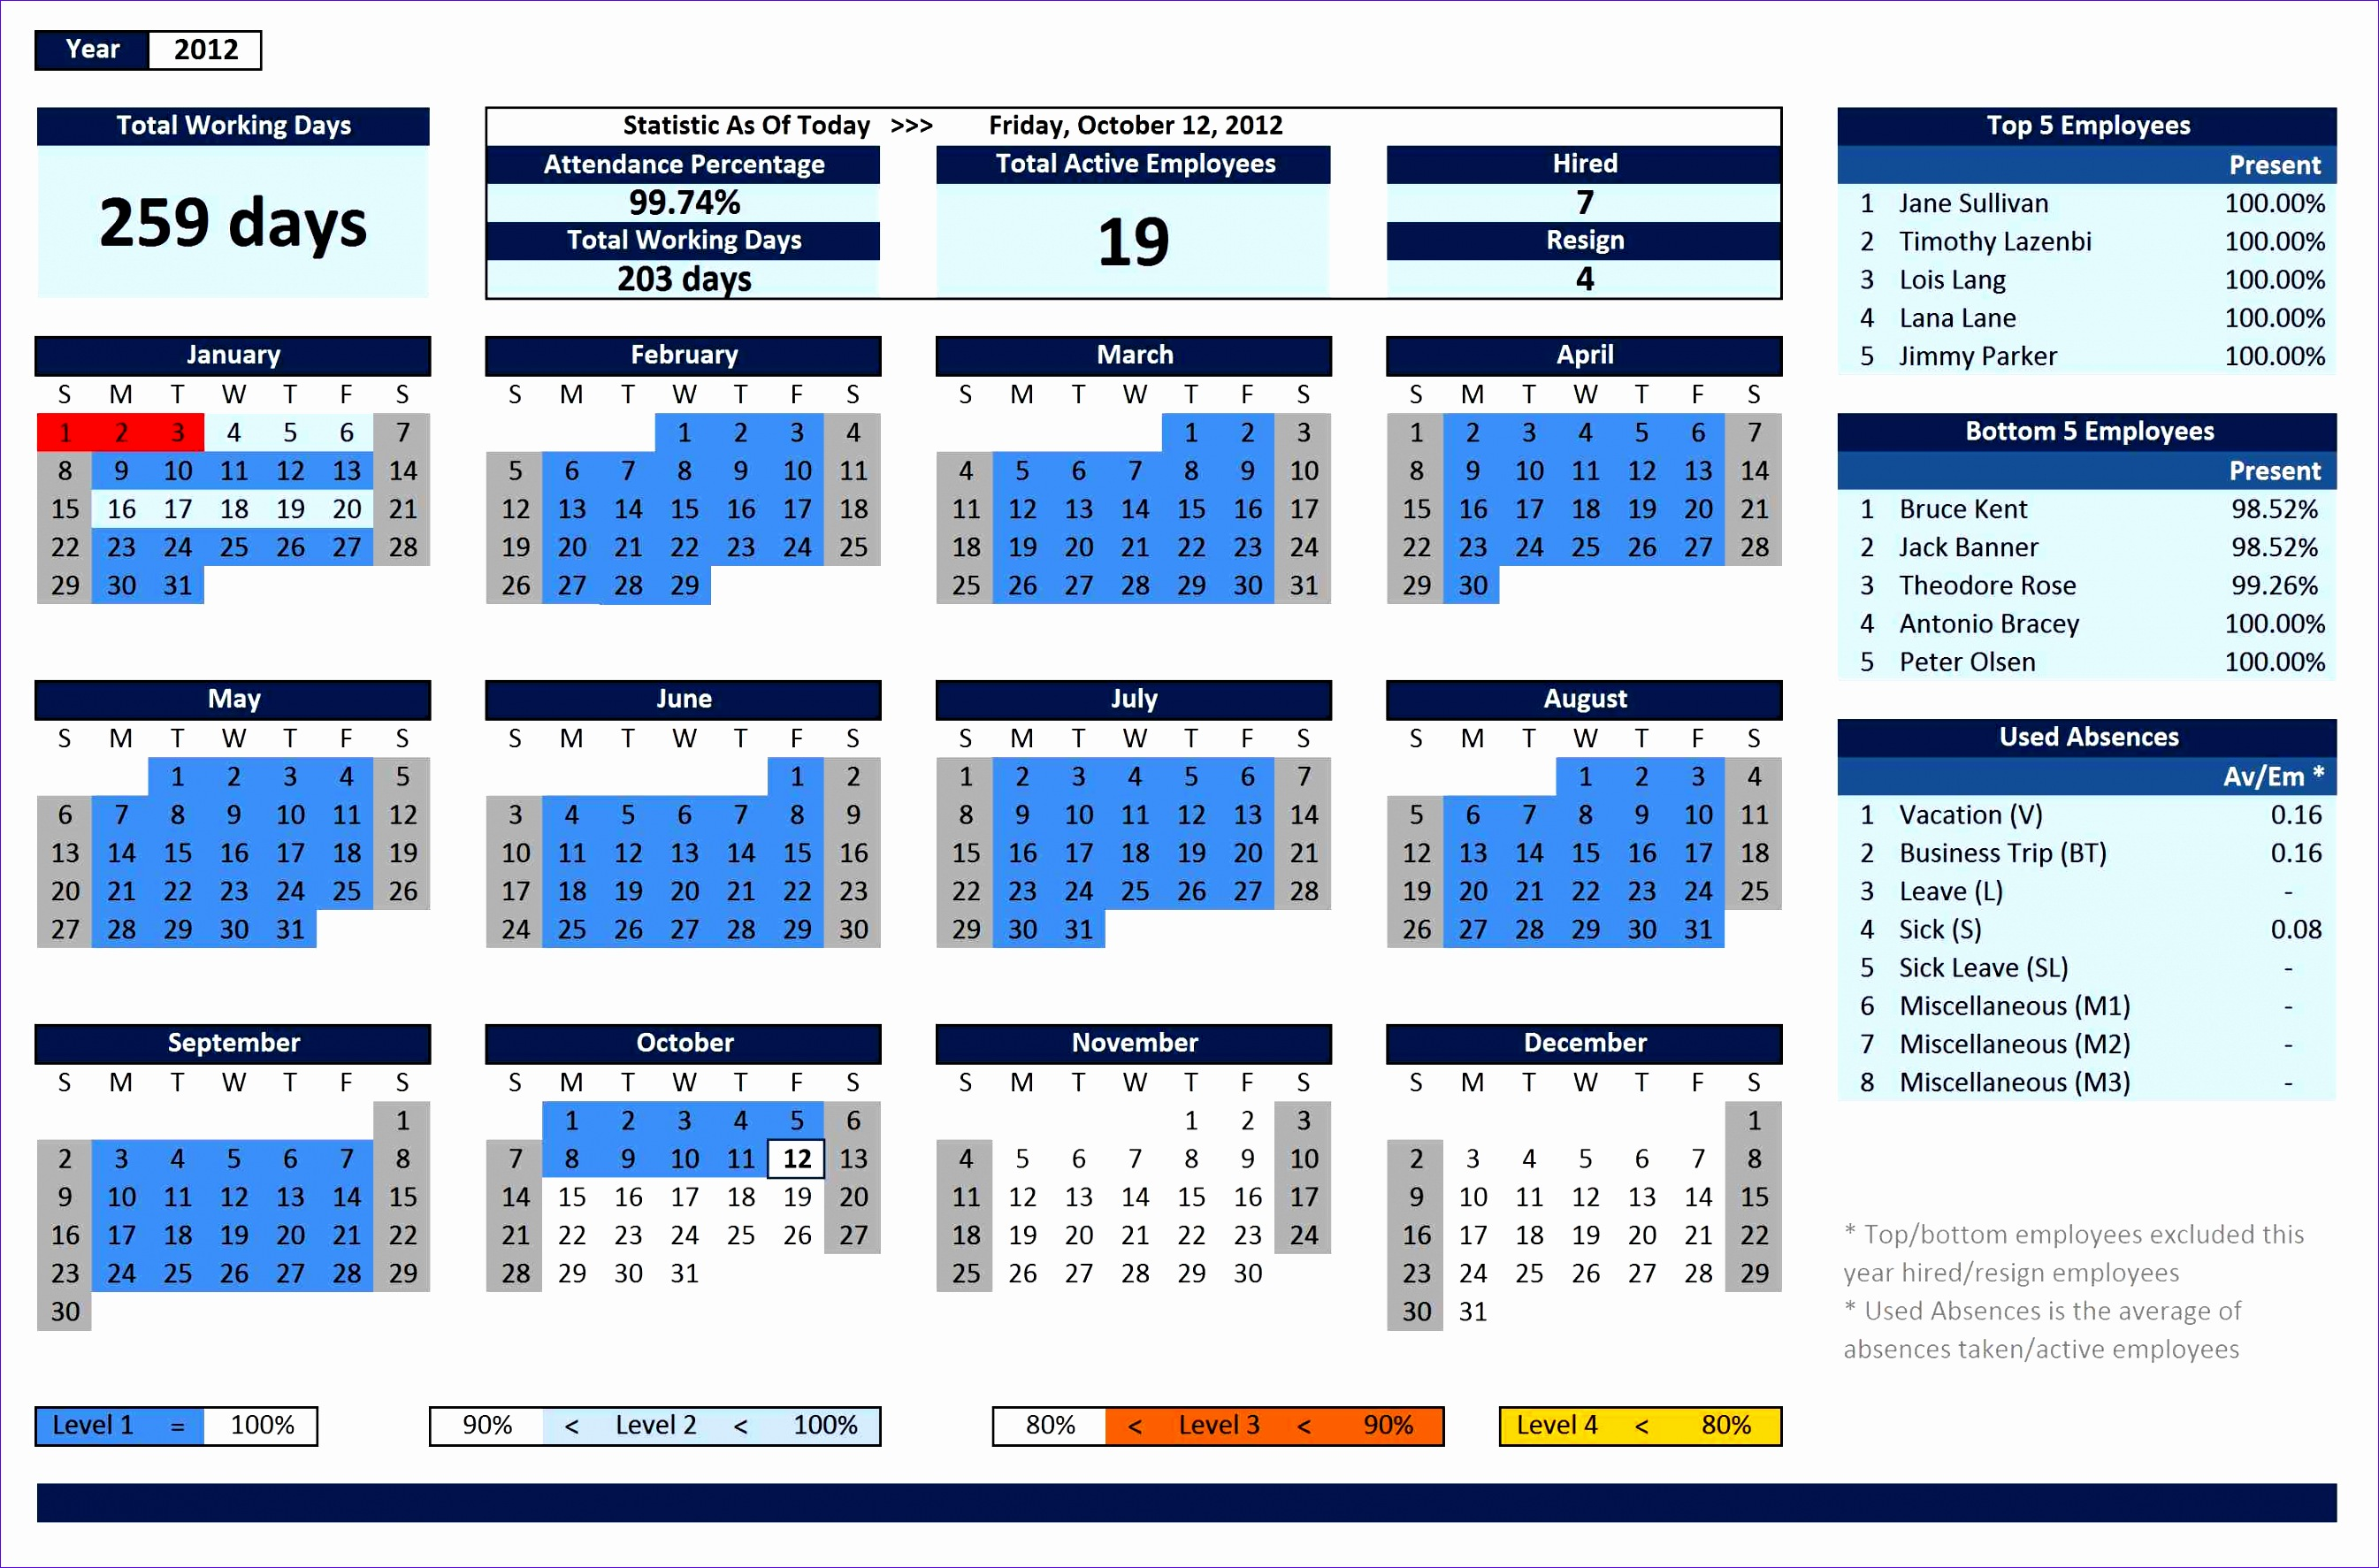 Excelindo Employee Attendance Calendar Pro V2 44 Dashboard